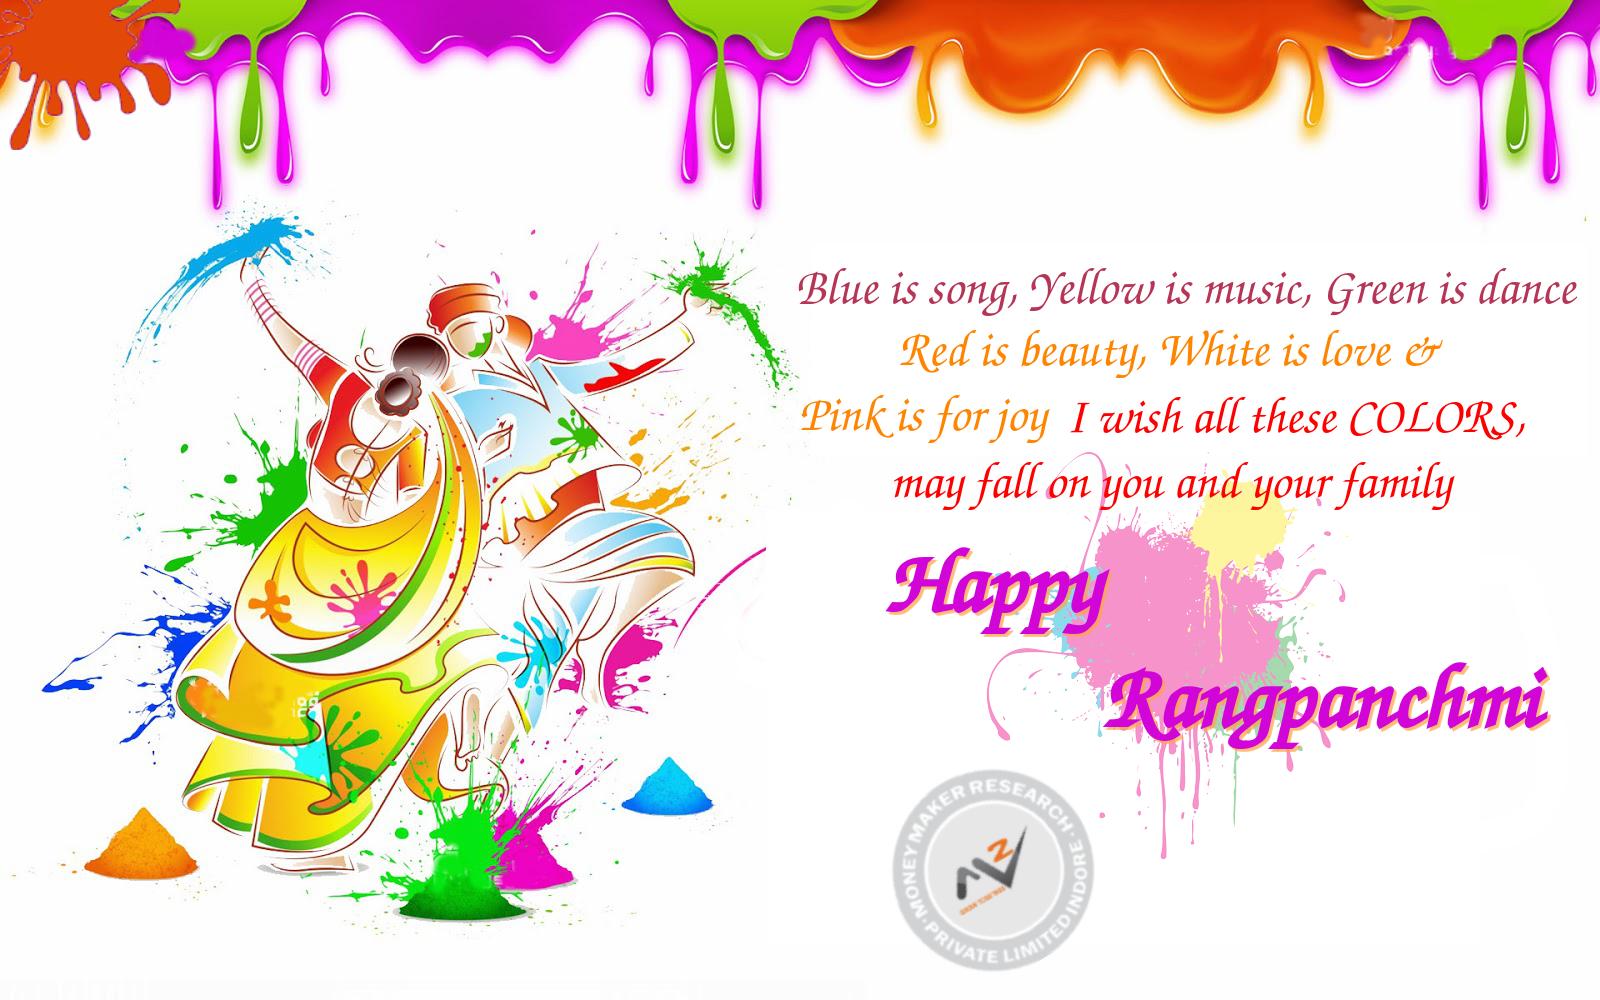 Happy Rangpanchmi Moneymakerresearch Happy Holi Happy Holi Photo Happy Holi Wallpaper